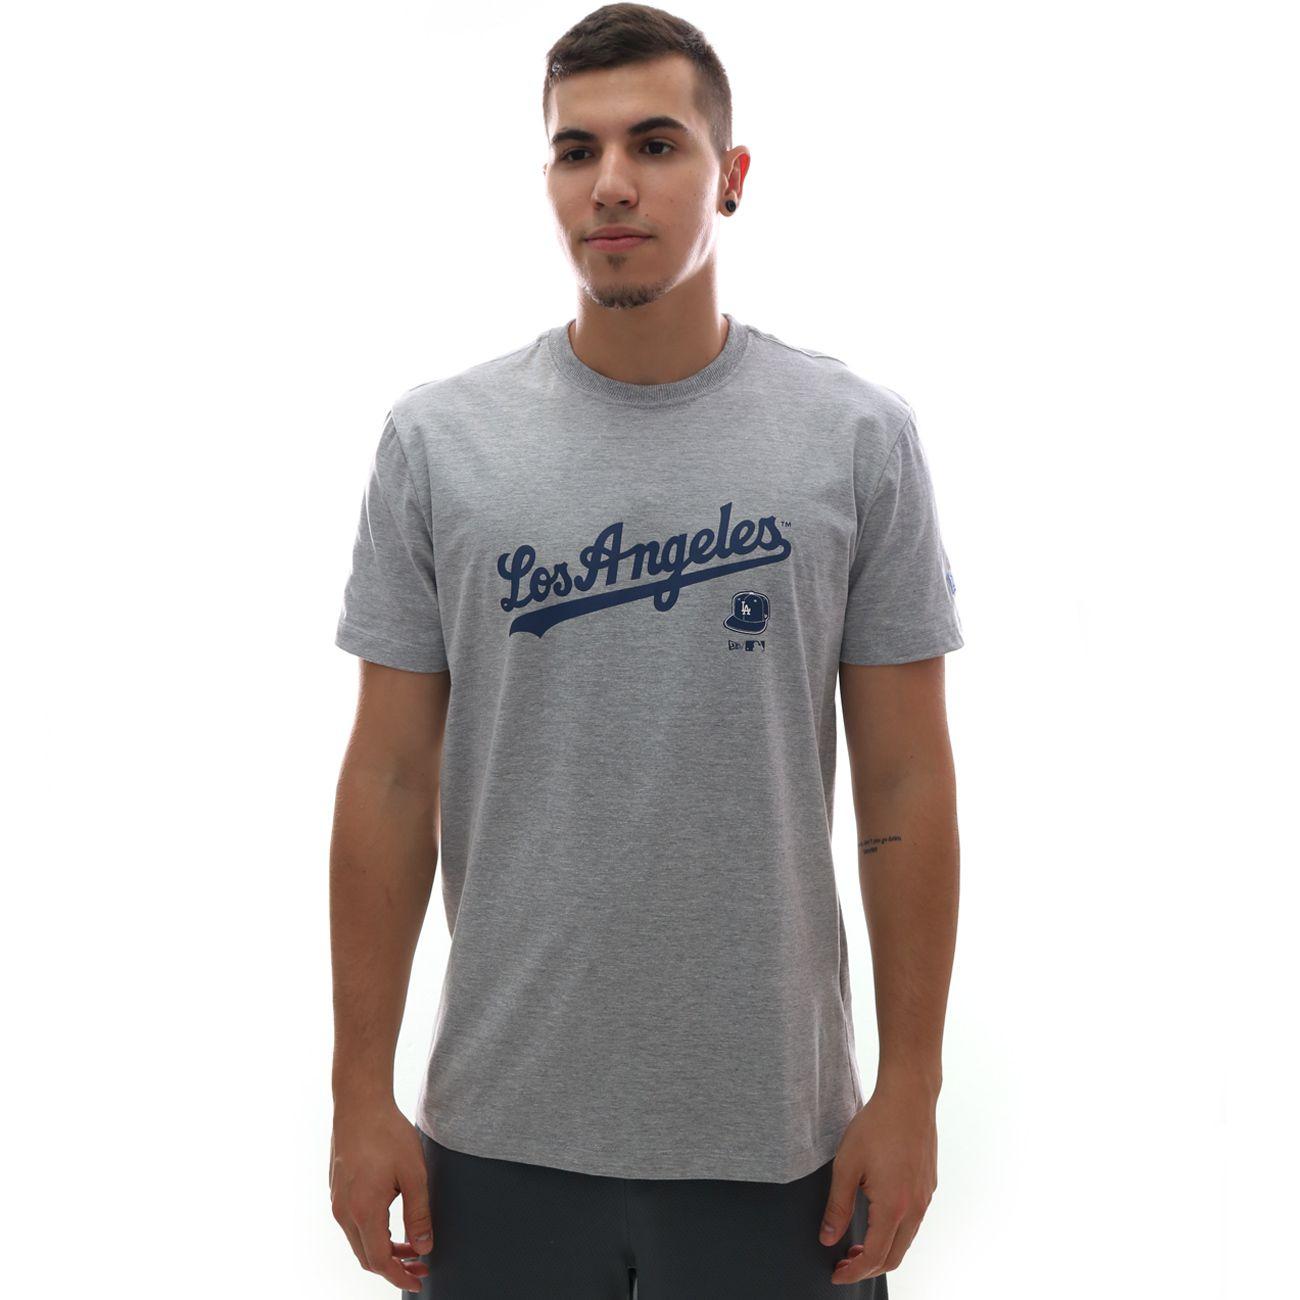 Camiseta New Era MLB Los Angeles Dodgers 90s Continues Basic